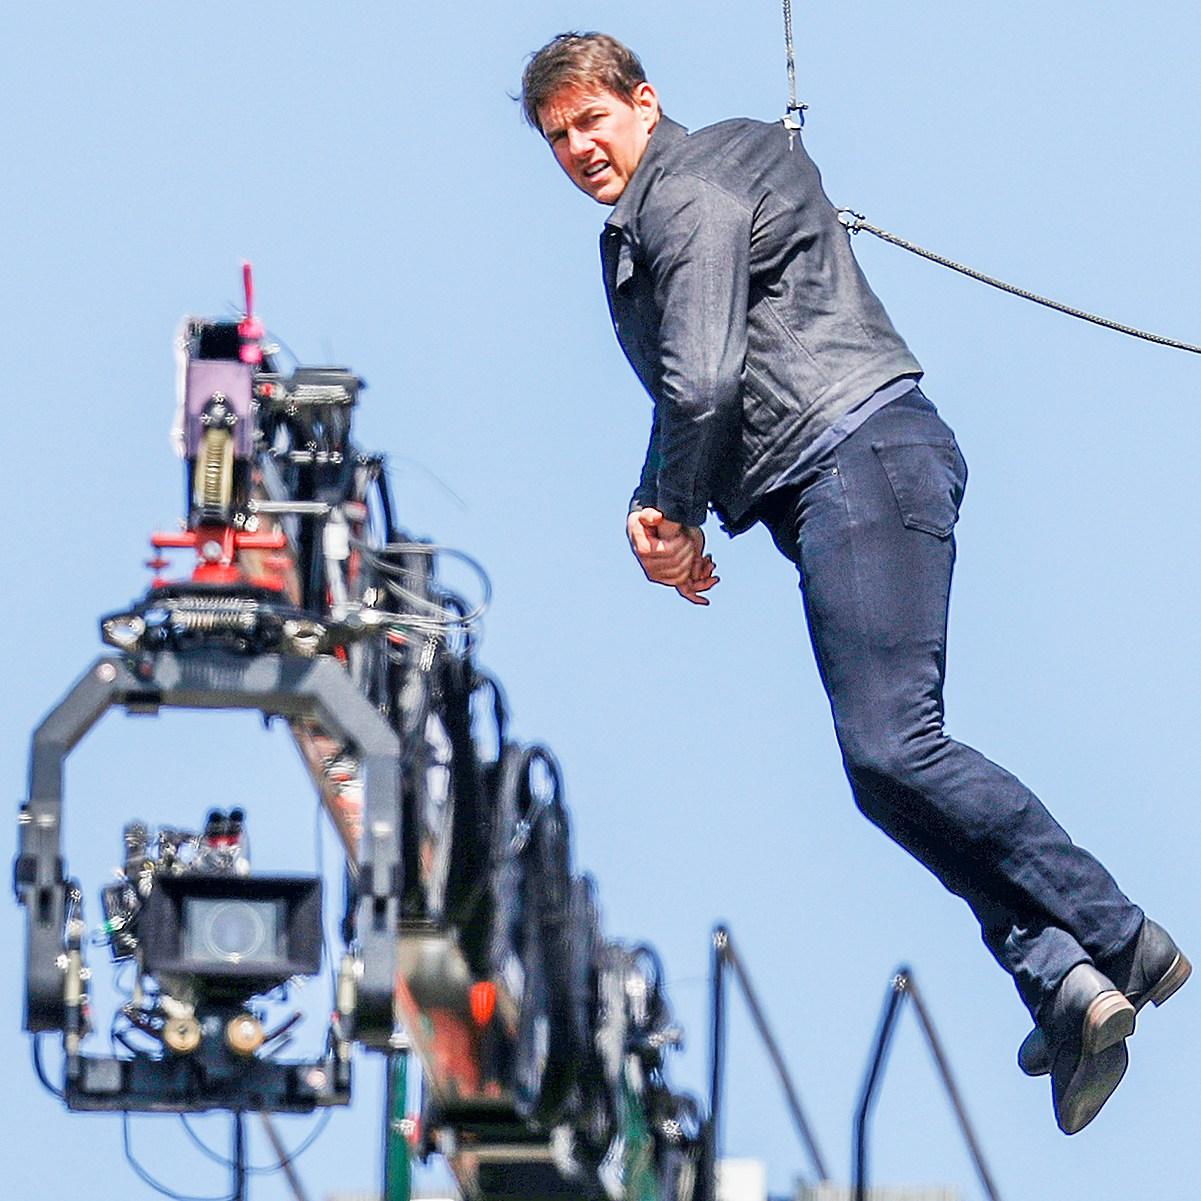 Tom Cruise Mission Impossible 6 Stunt injury